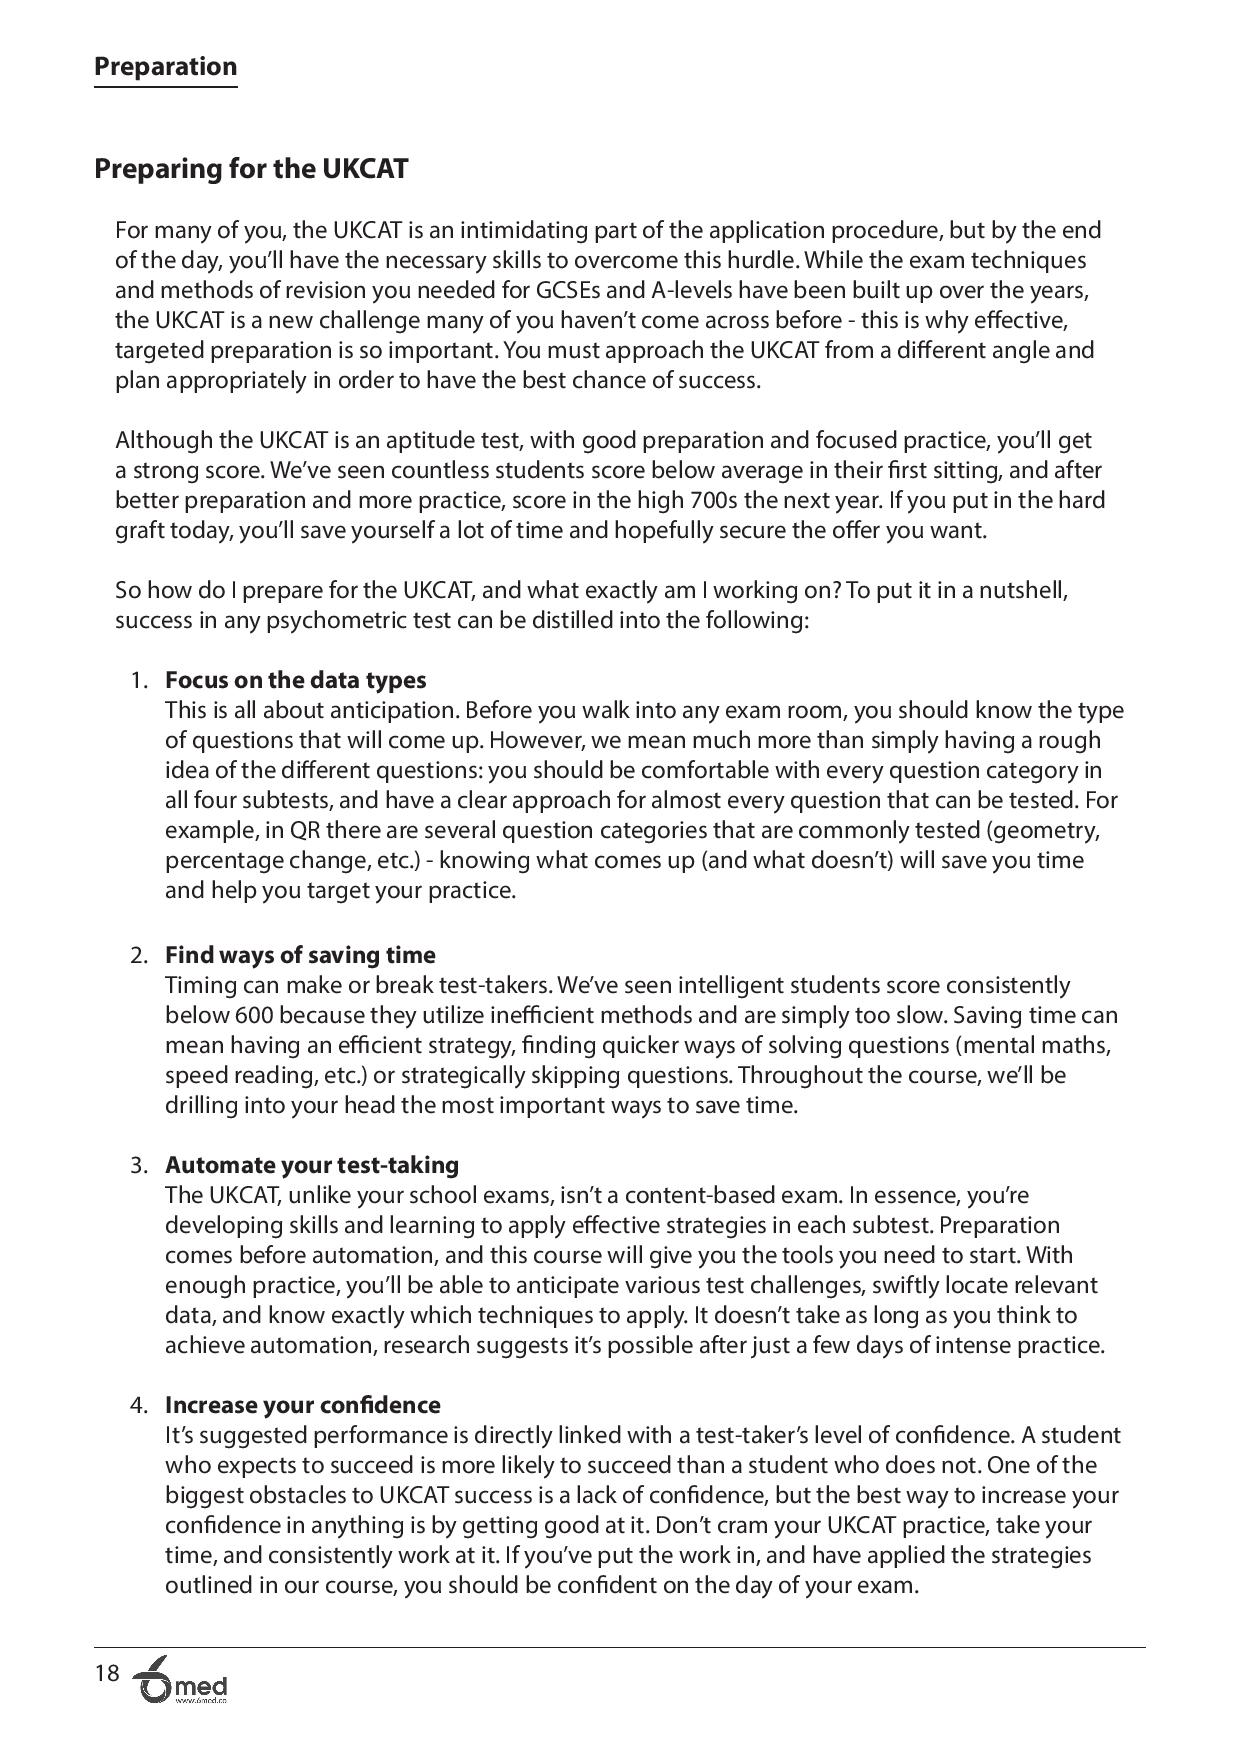 UKCAT Crash Course handbook page 18